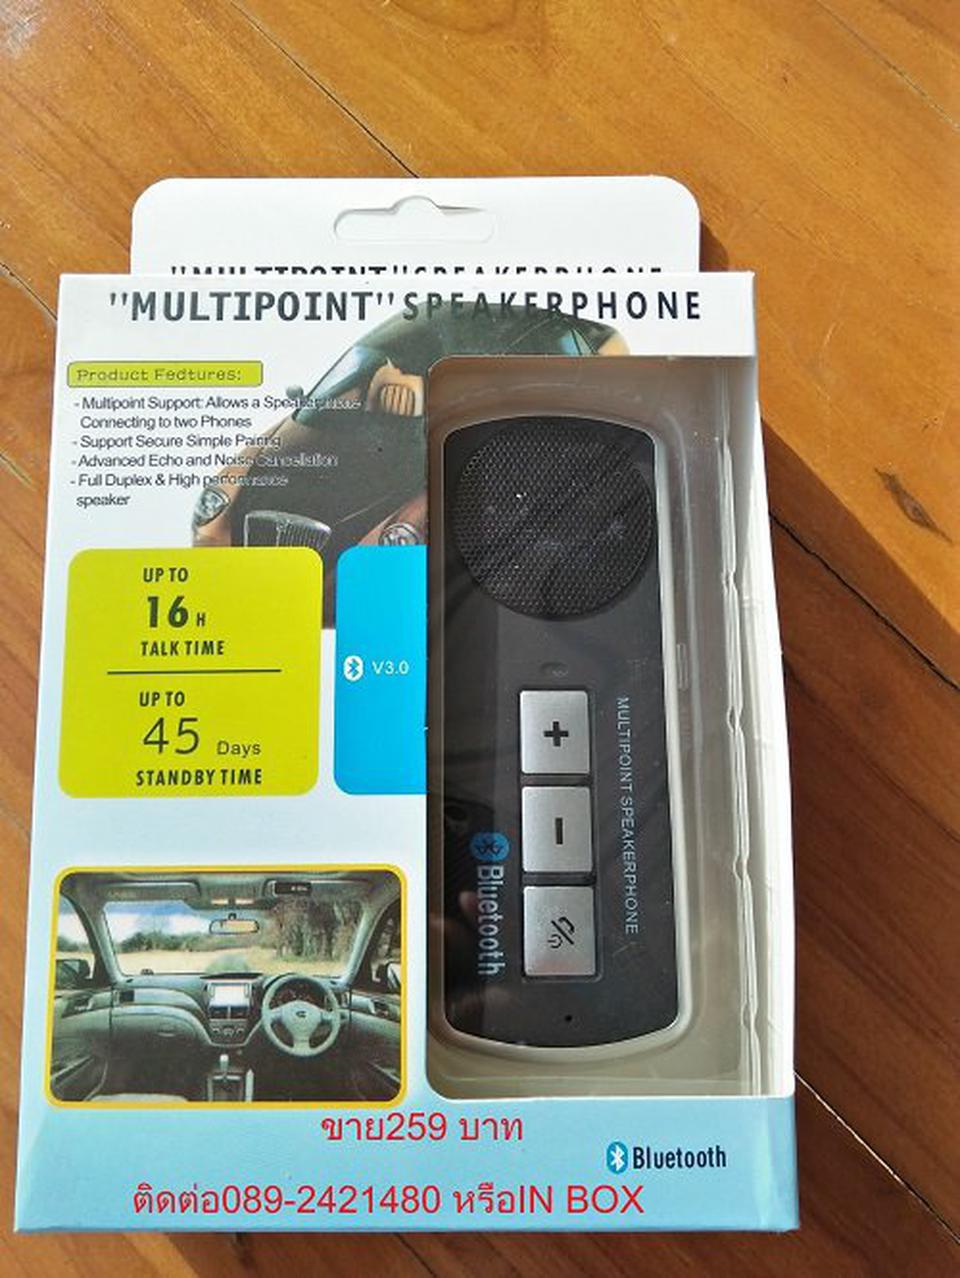 Mutipoint Speaker Phone  Bluetooth รูปที่ 1